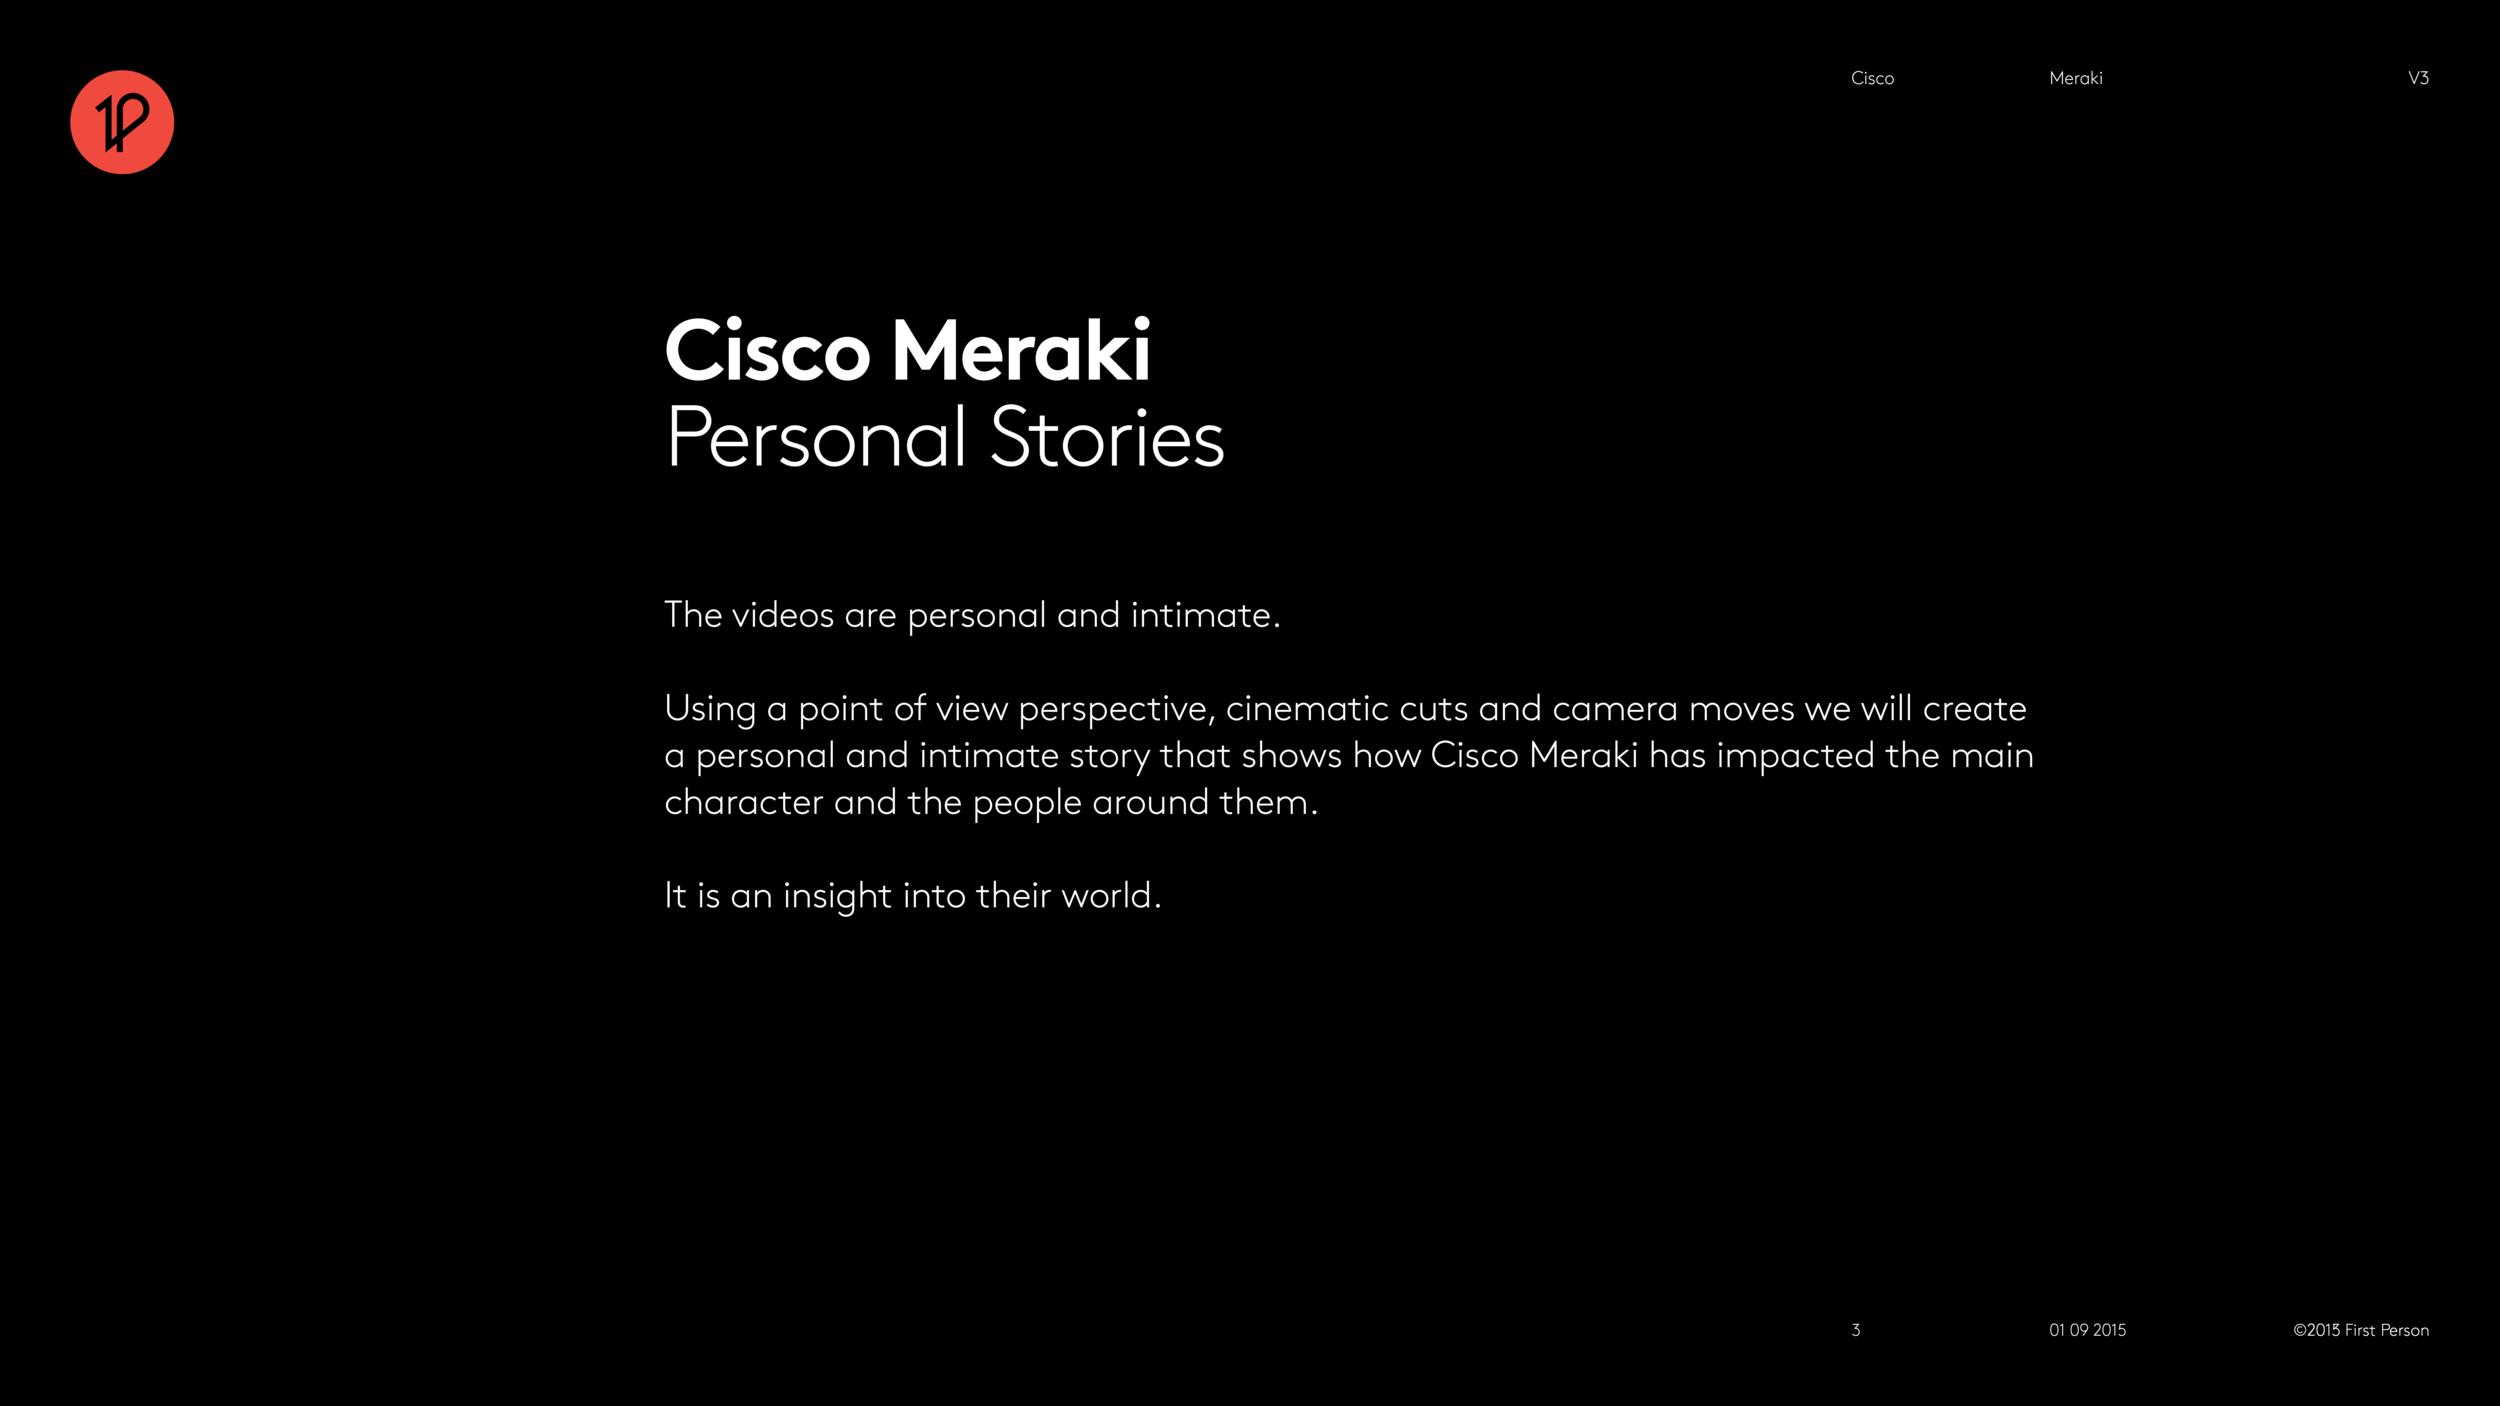 3431_CiscoMeraki_Storyboards_v03-3.png